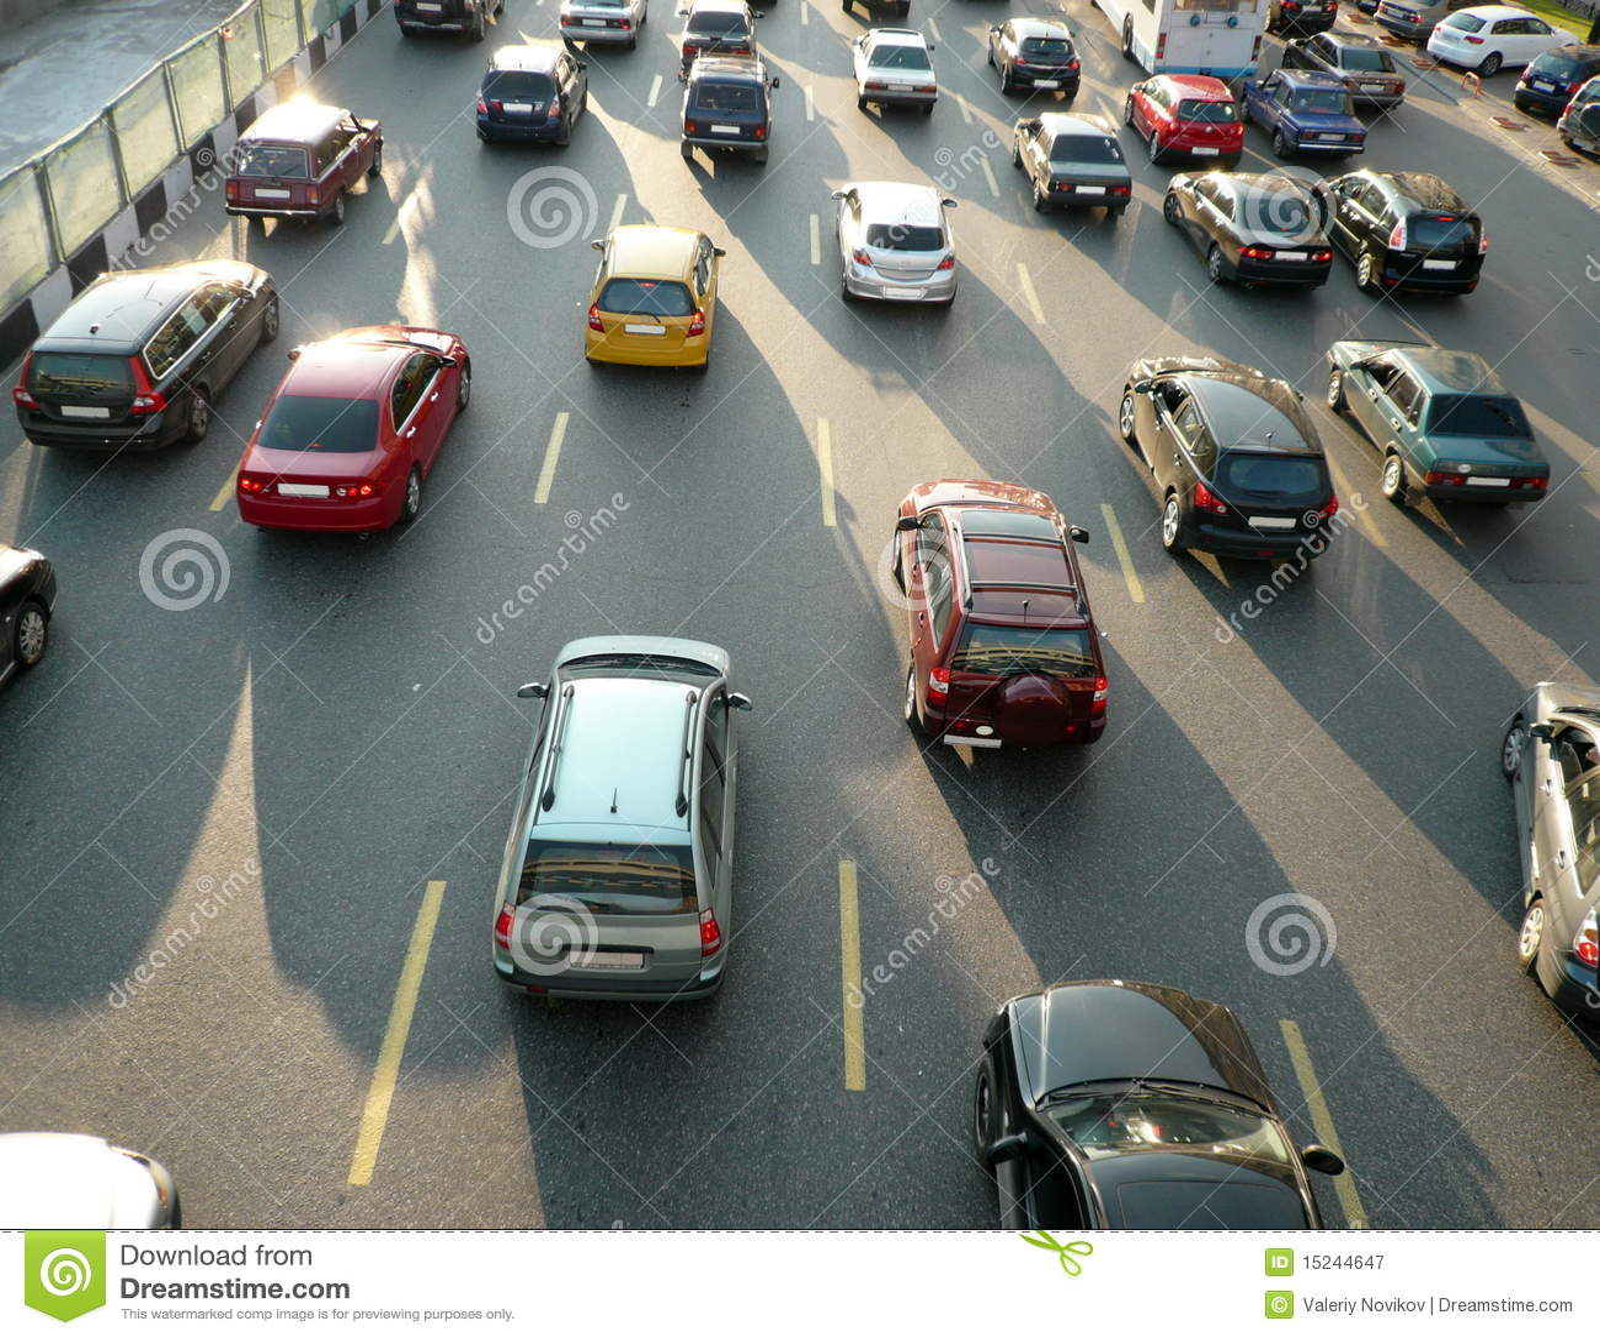 Many of car on street stock image. Image of photo, traffic - 15244647